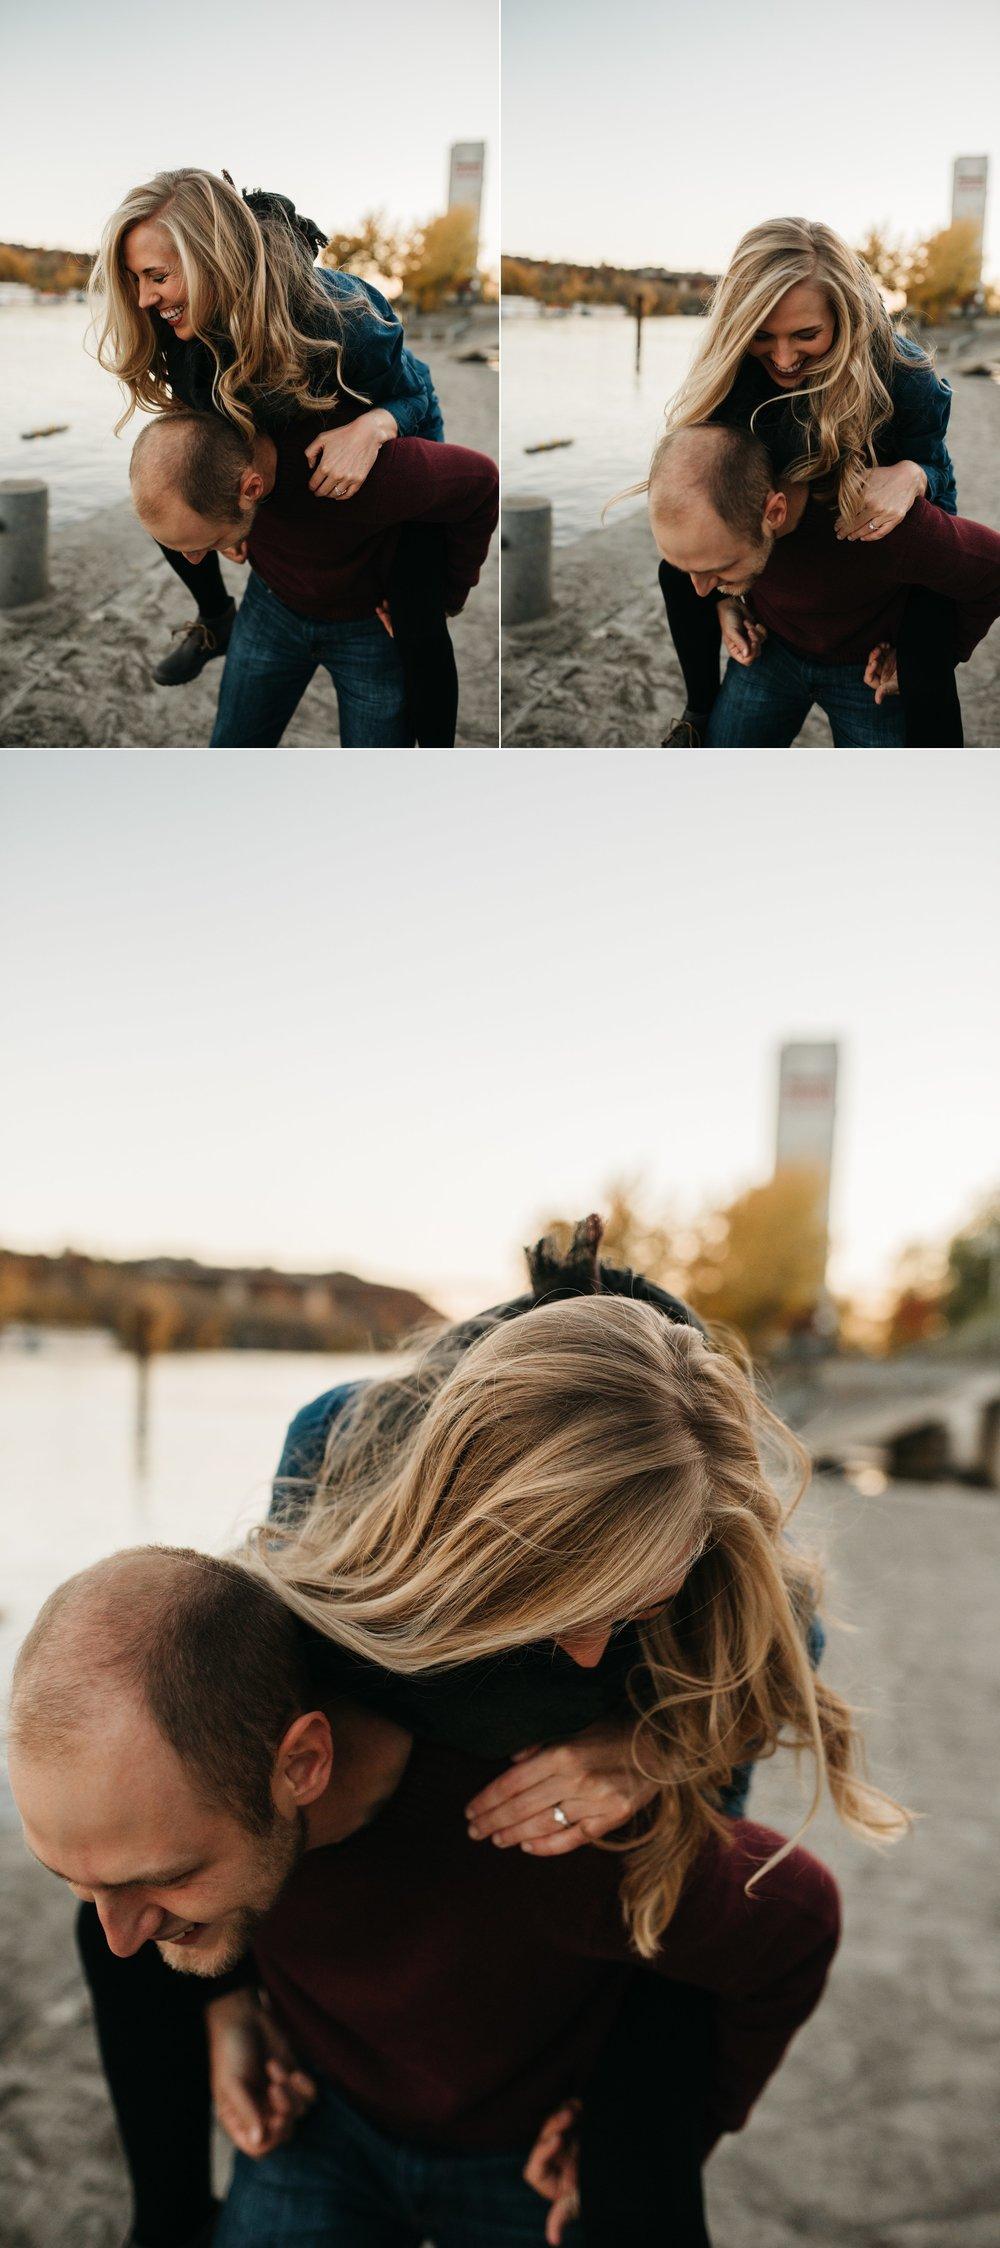 caroline and taylor minneapolis minnesota texas austin dallas houston wedding elopement destination intimate adventurous couple best photographer_0038.jpg